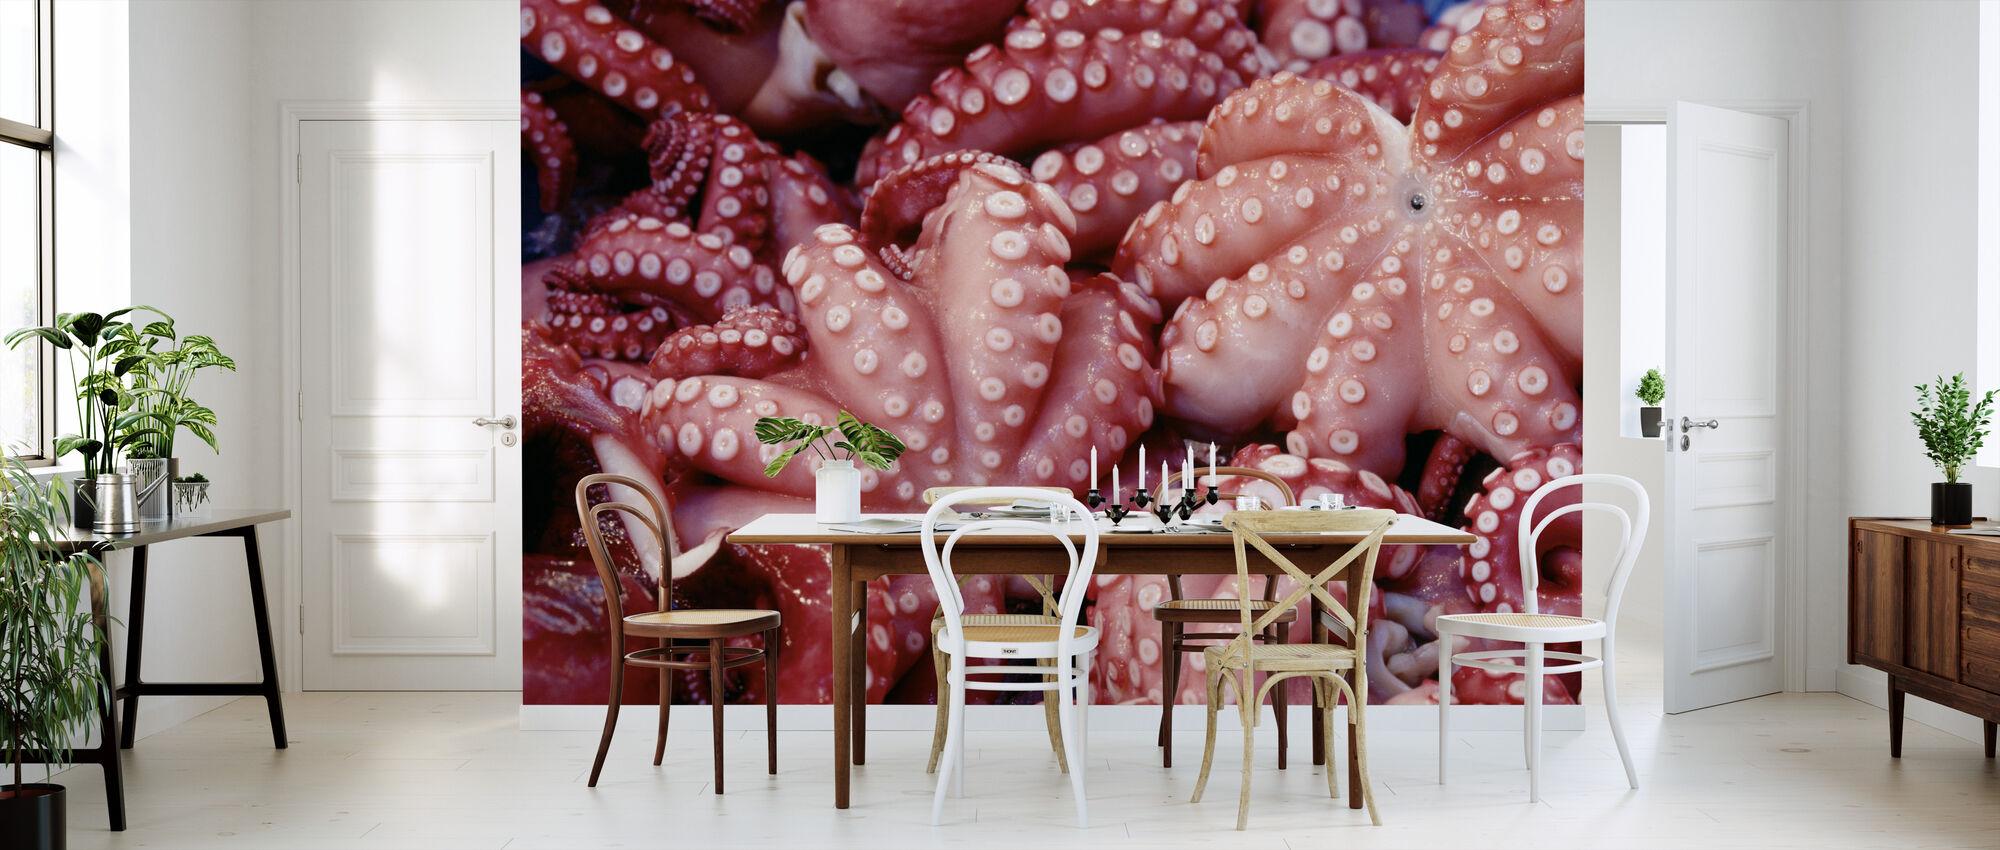 Japanese Octopus - Wallpaper - Kitchen